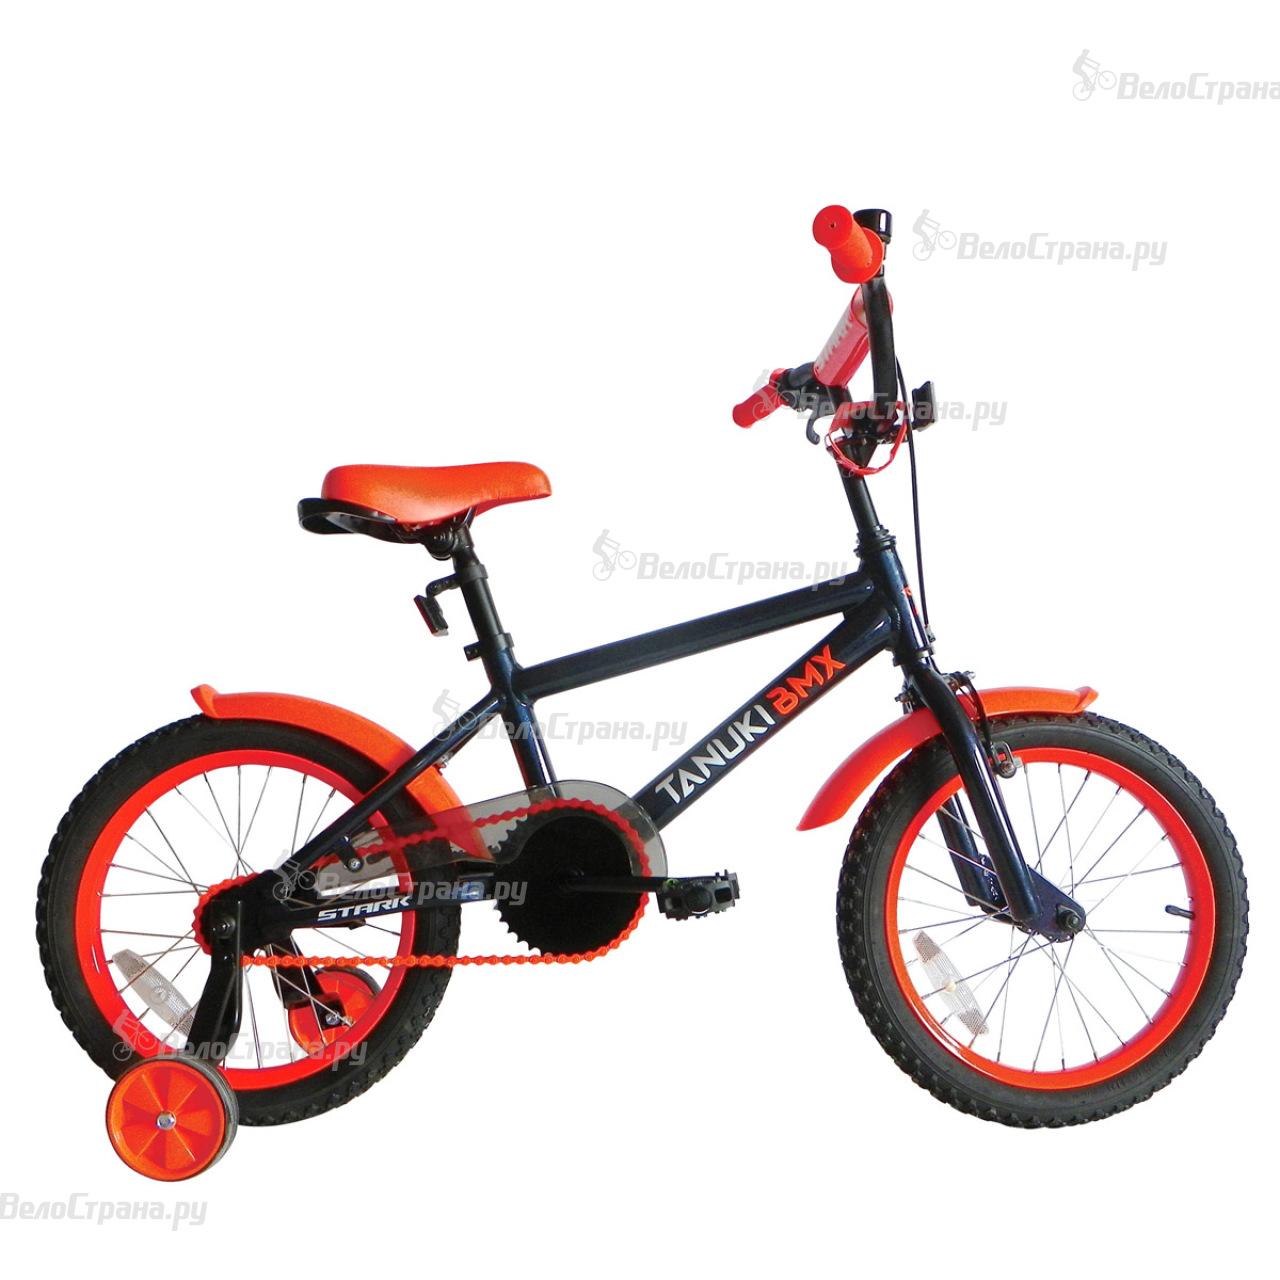 Велосипед Stark Tanuki 16 BMX (2017) stark outpost 16 2016 blue orange